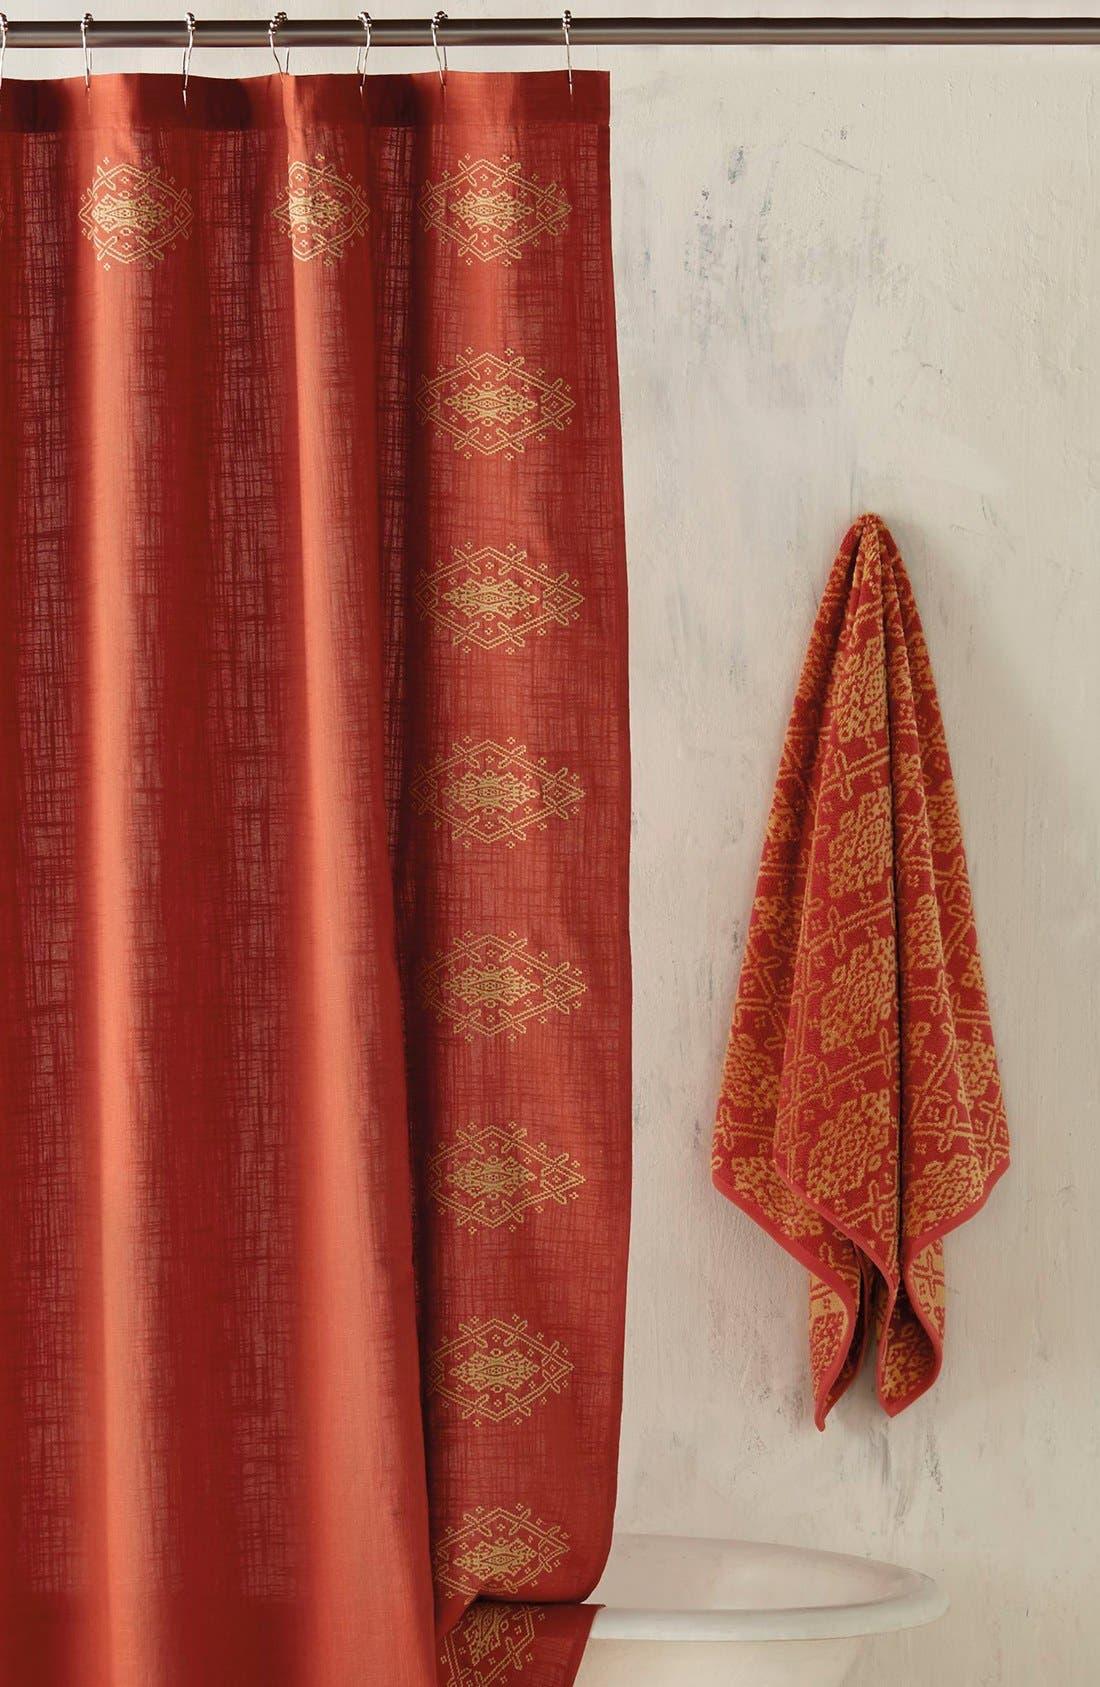 'Cusa' Shower Curtain,                             Main thumbnail 1, color,                             600